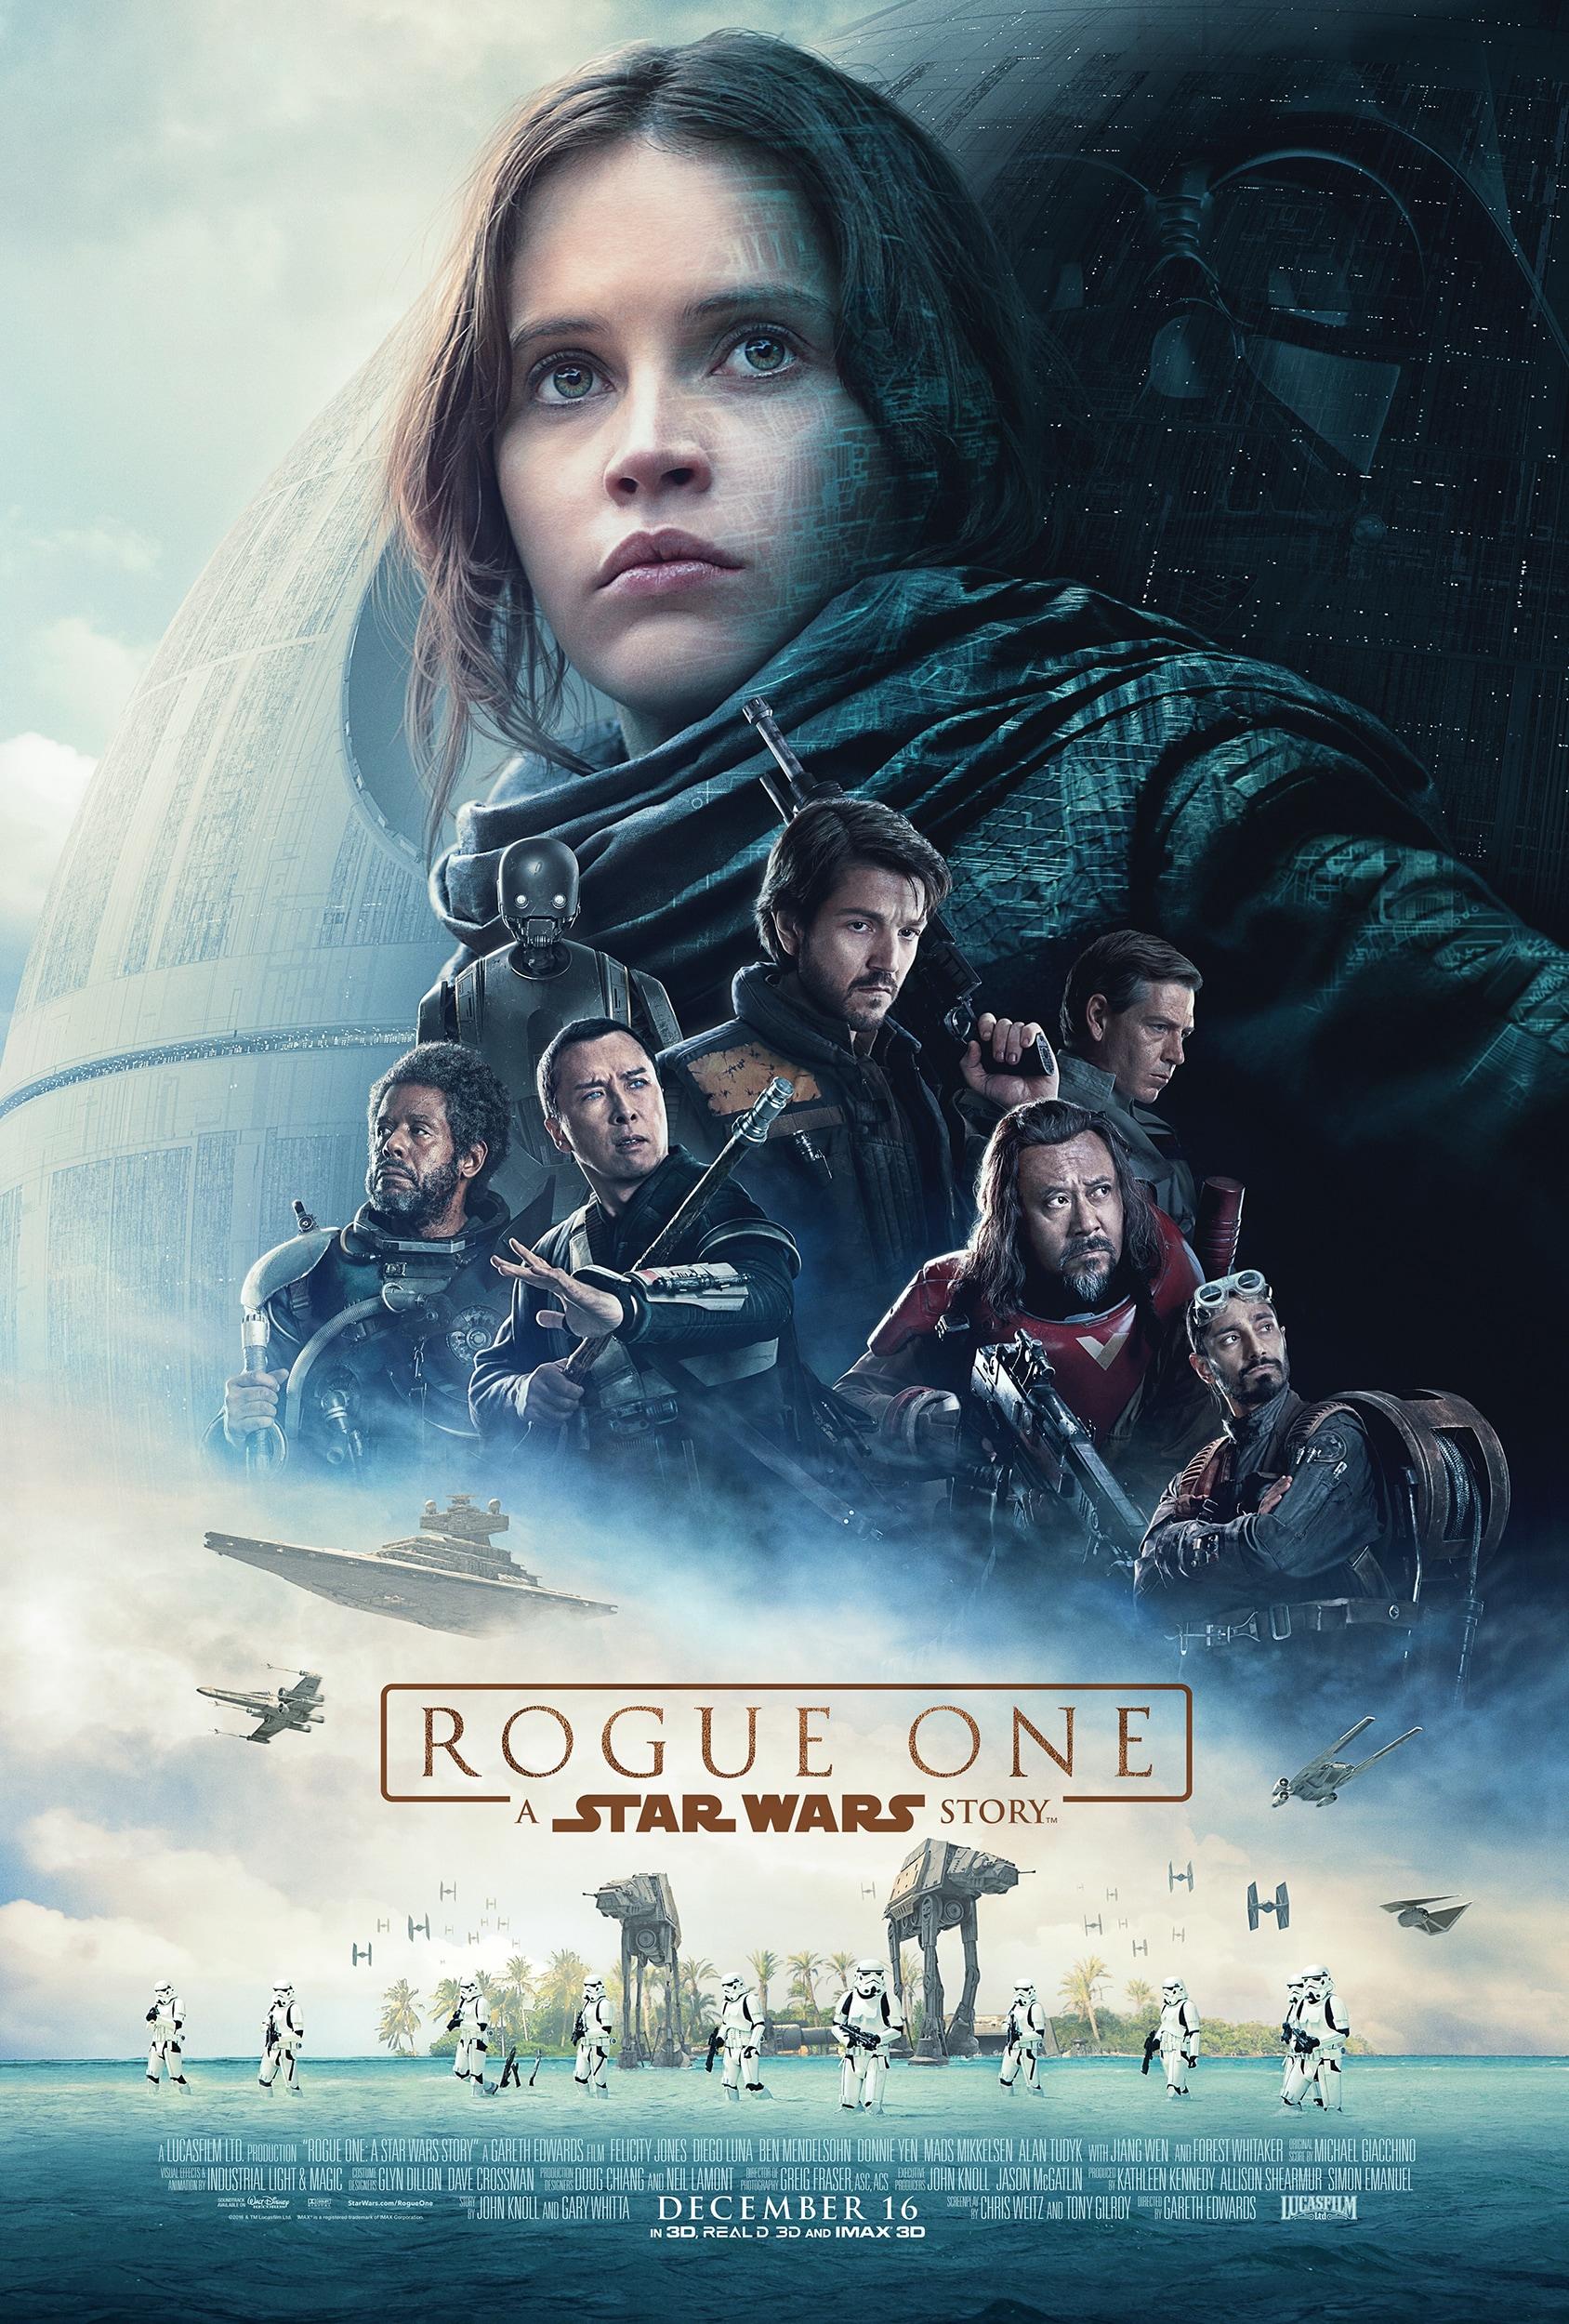 Rogue One A Star Wars Story Nuova Locandina Intera